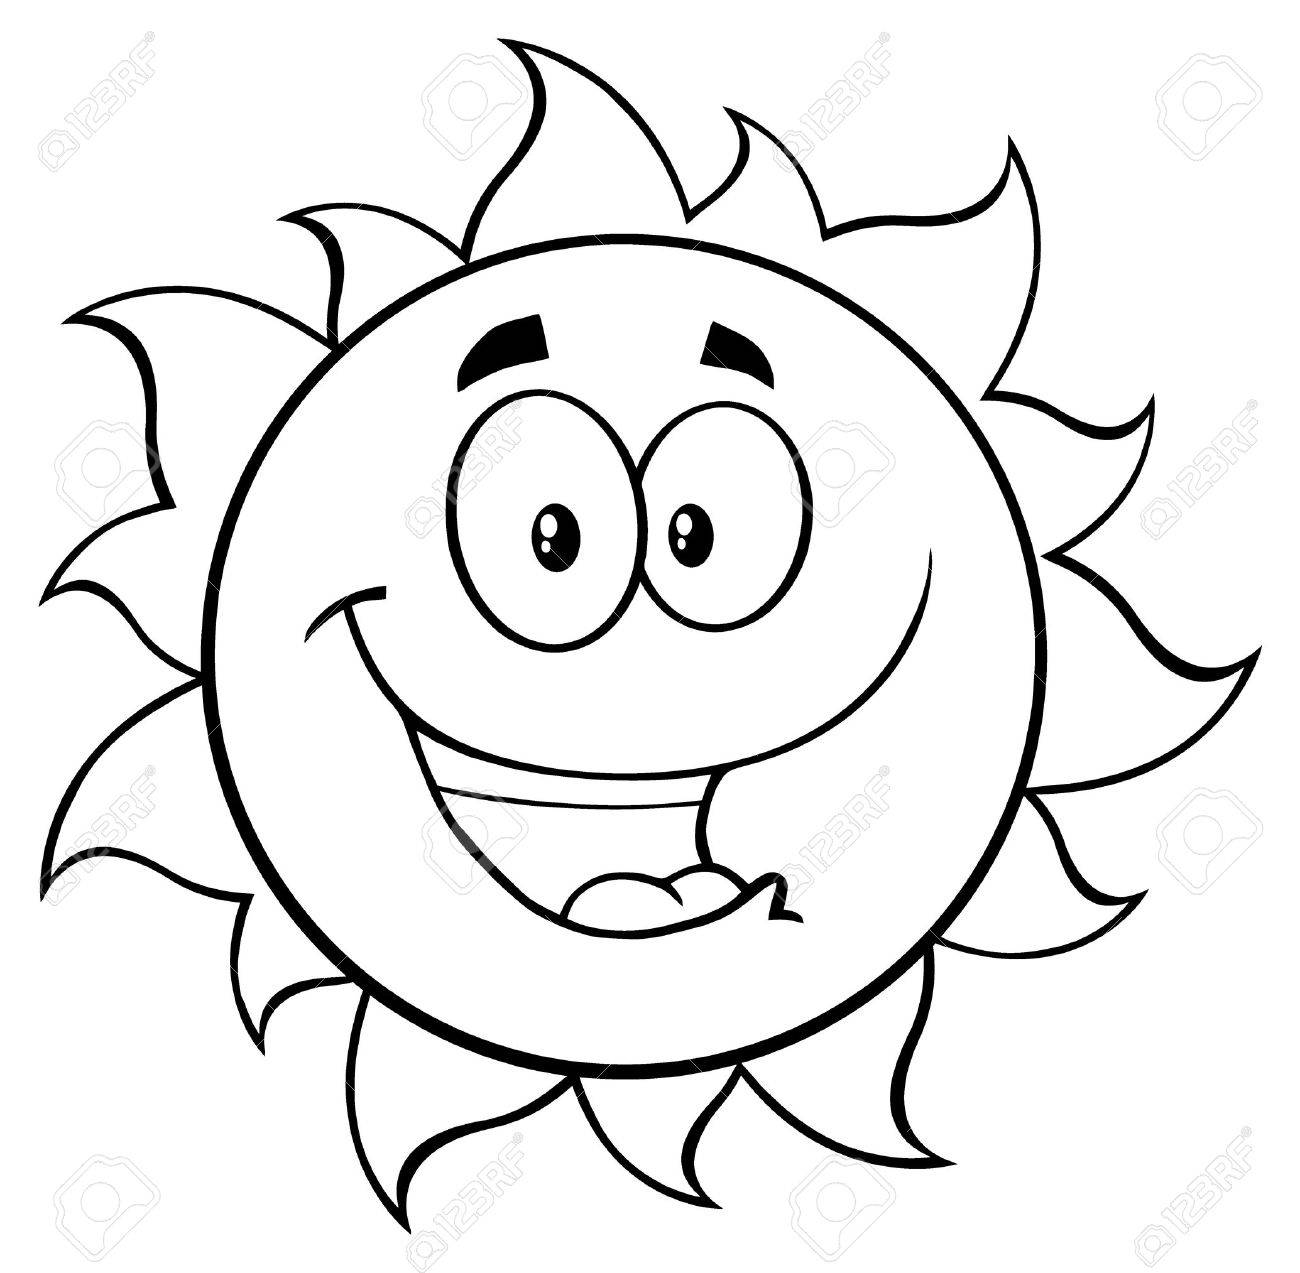 Line Drawing Sun Vector : Cartoon sun drawing at getdrawings free for personal